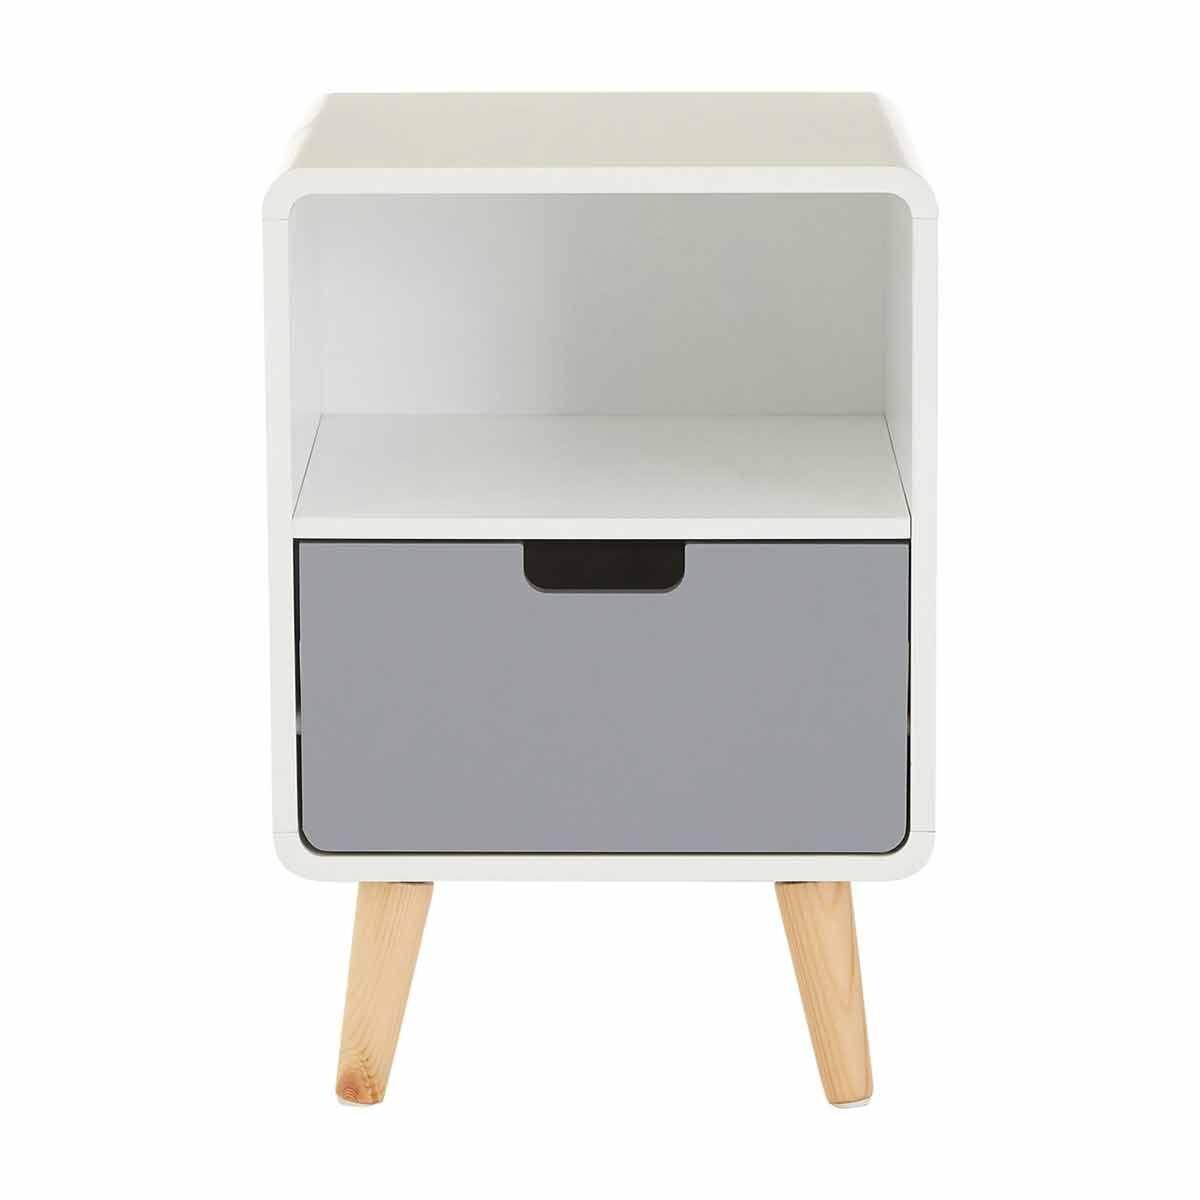 Premier Housewares Milo 1 Drawer Cabinet with Shelf